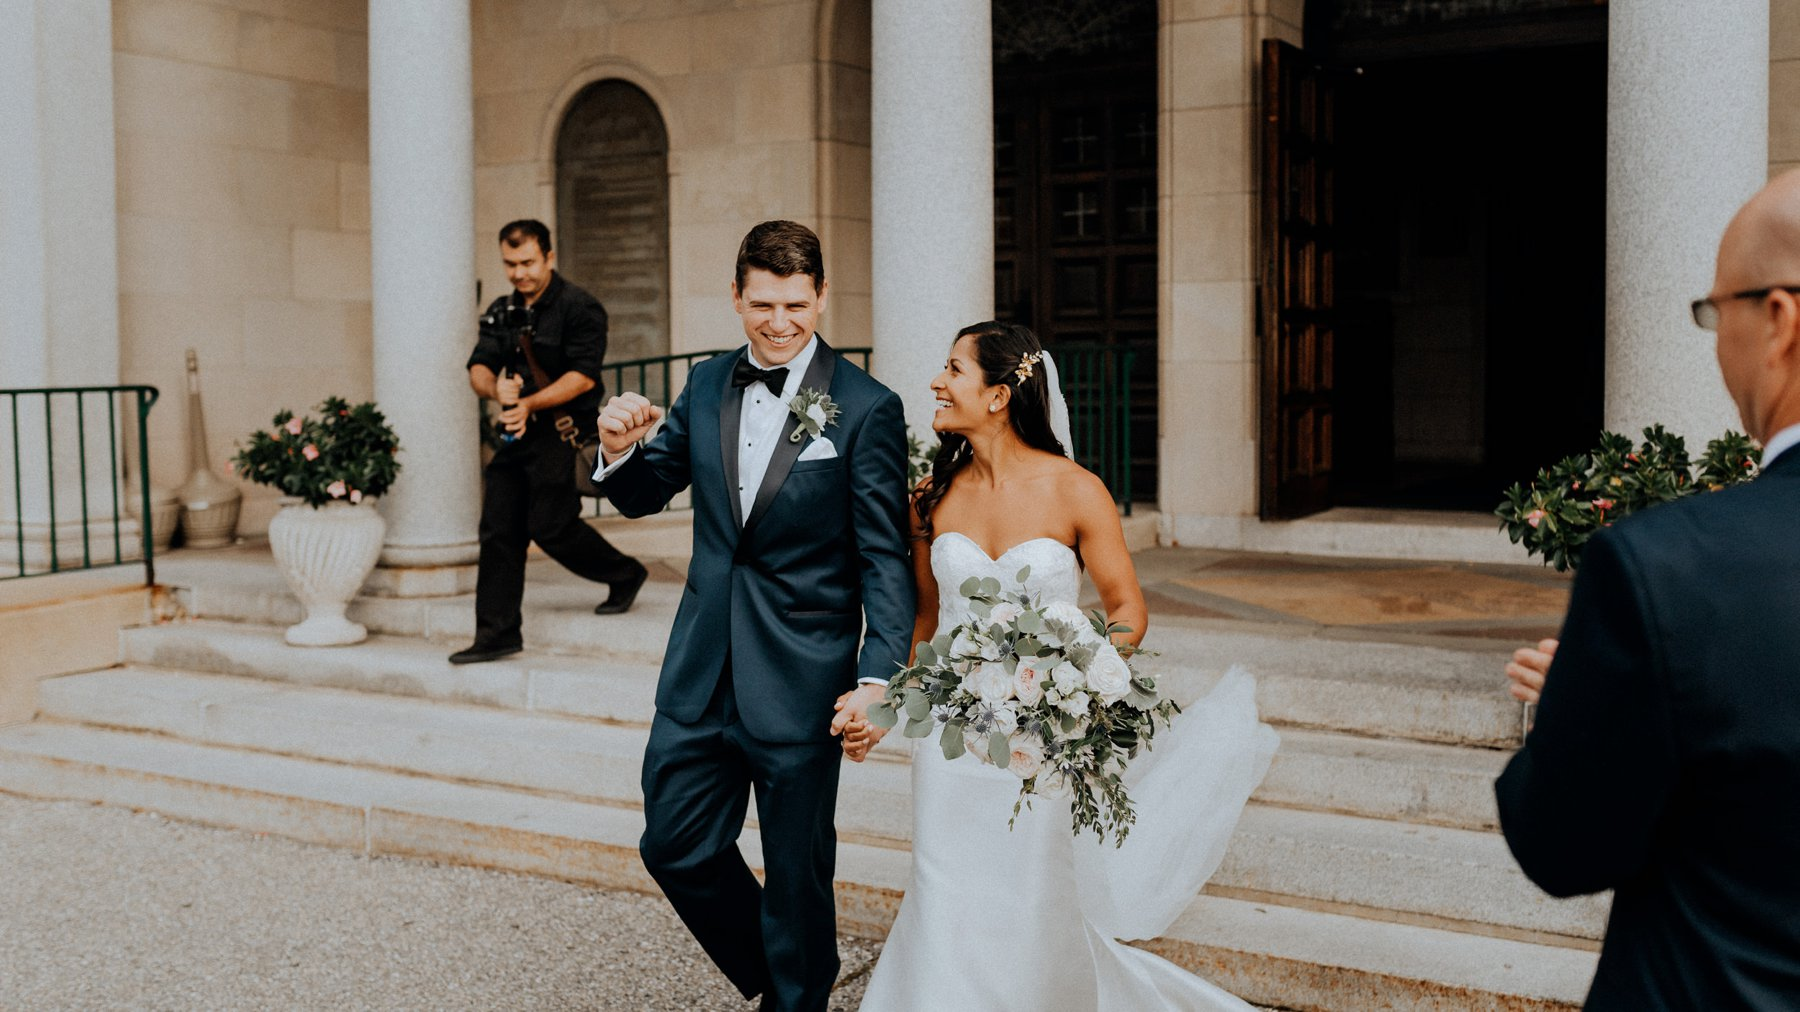 279-281-private-estate-wedding-2-2.jpg